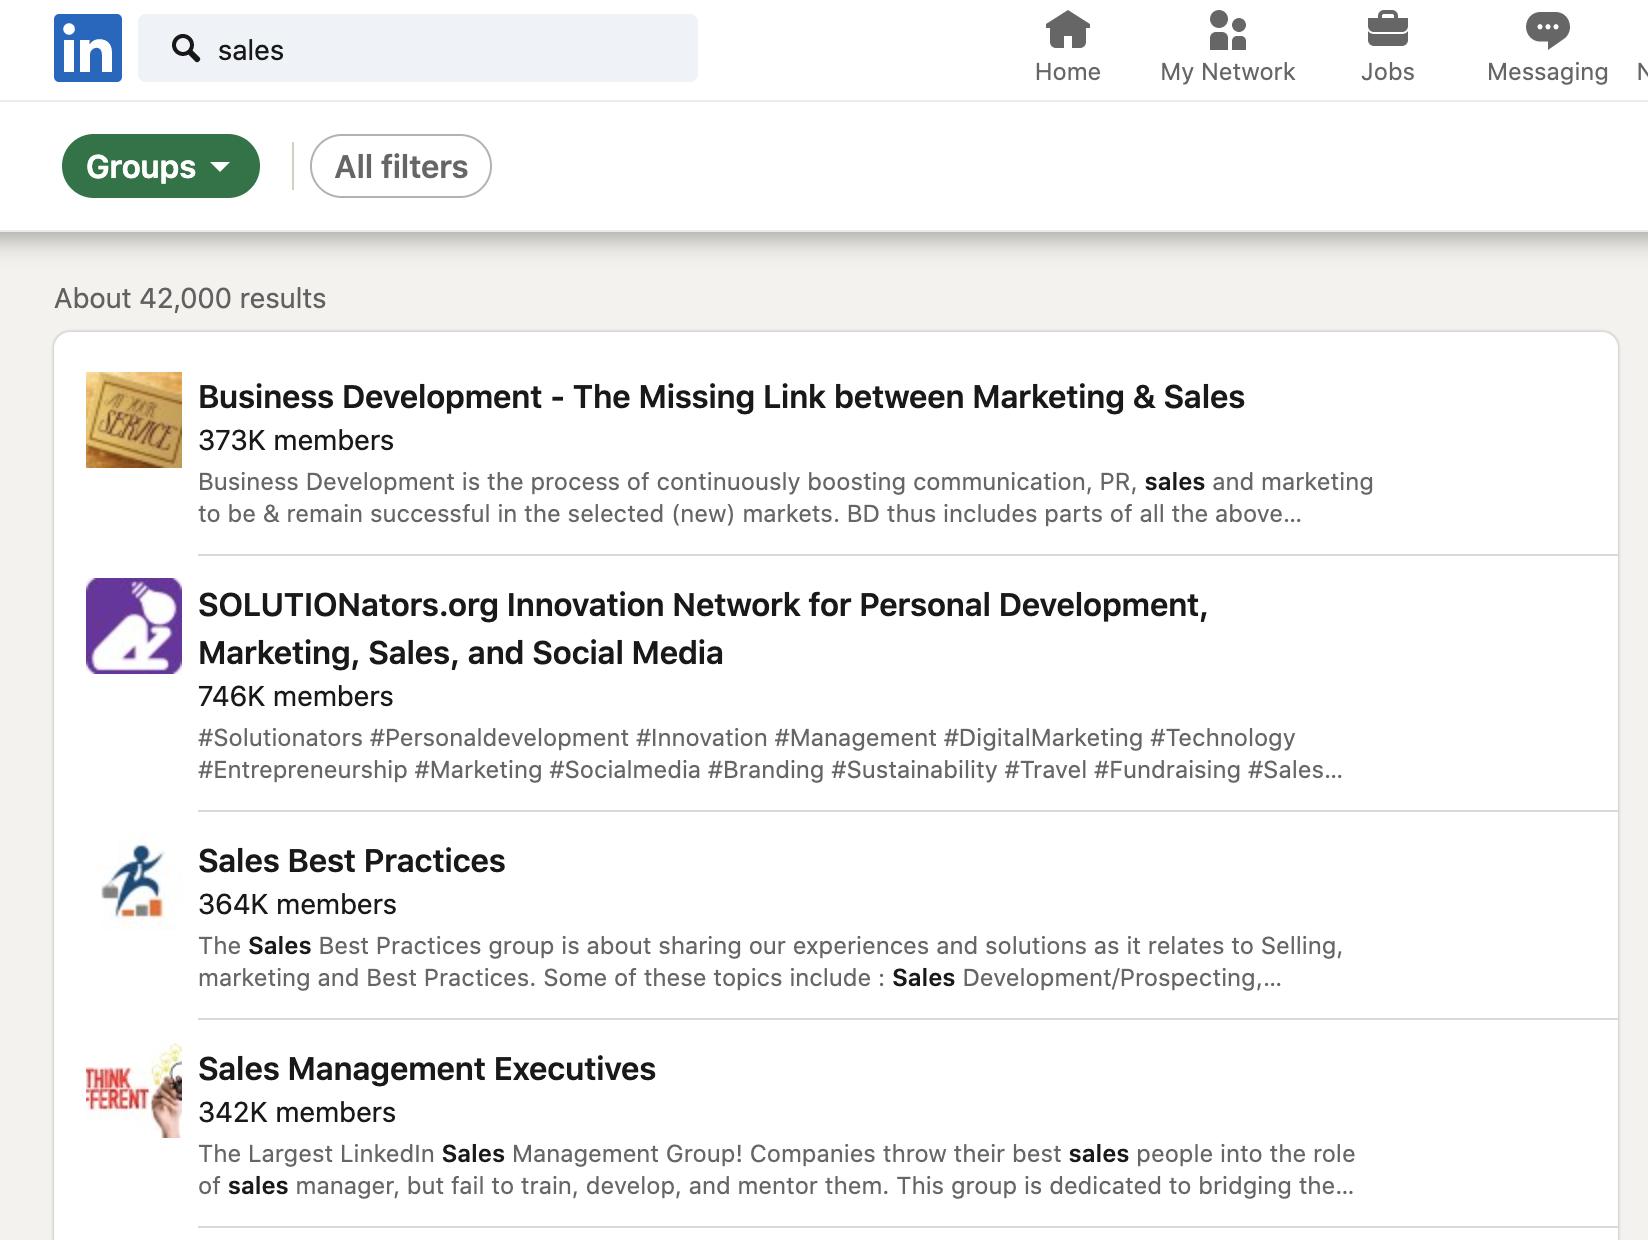 using LinkedIn for sales - LinkedIn groups